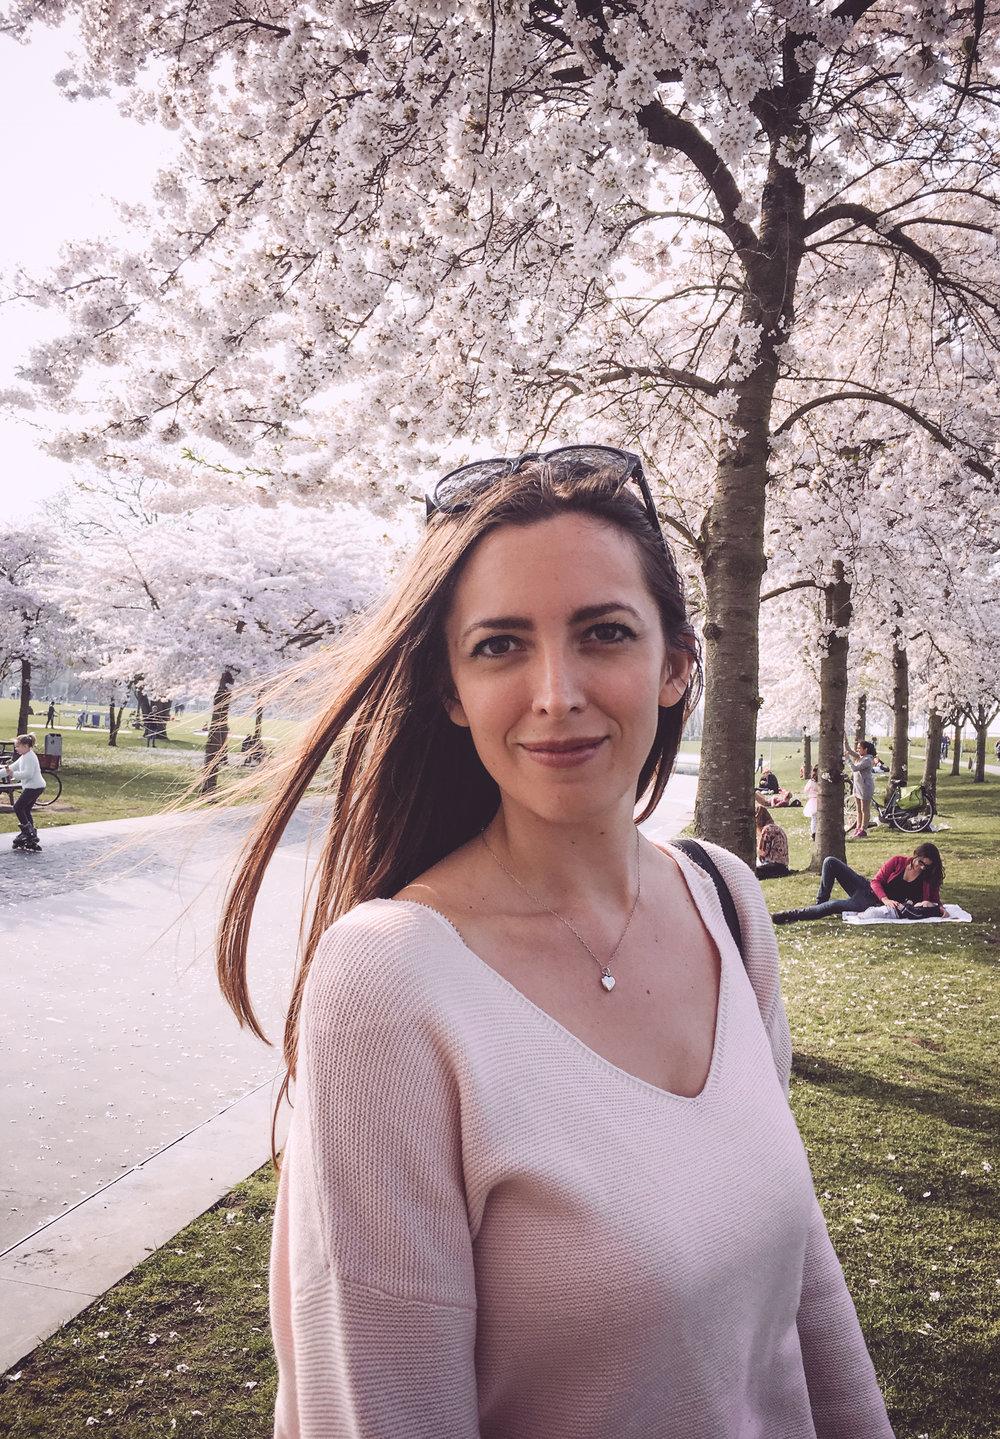 2018 APR Amsterdam Cherry Blossom Pink se+.jpg